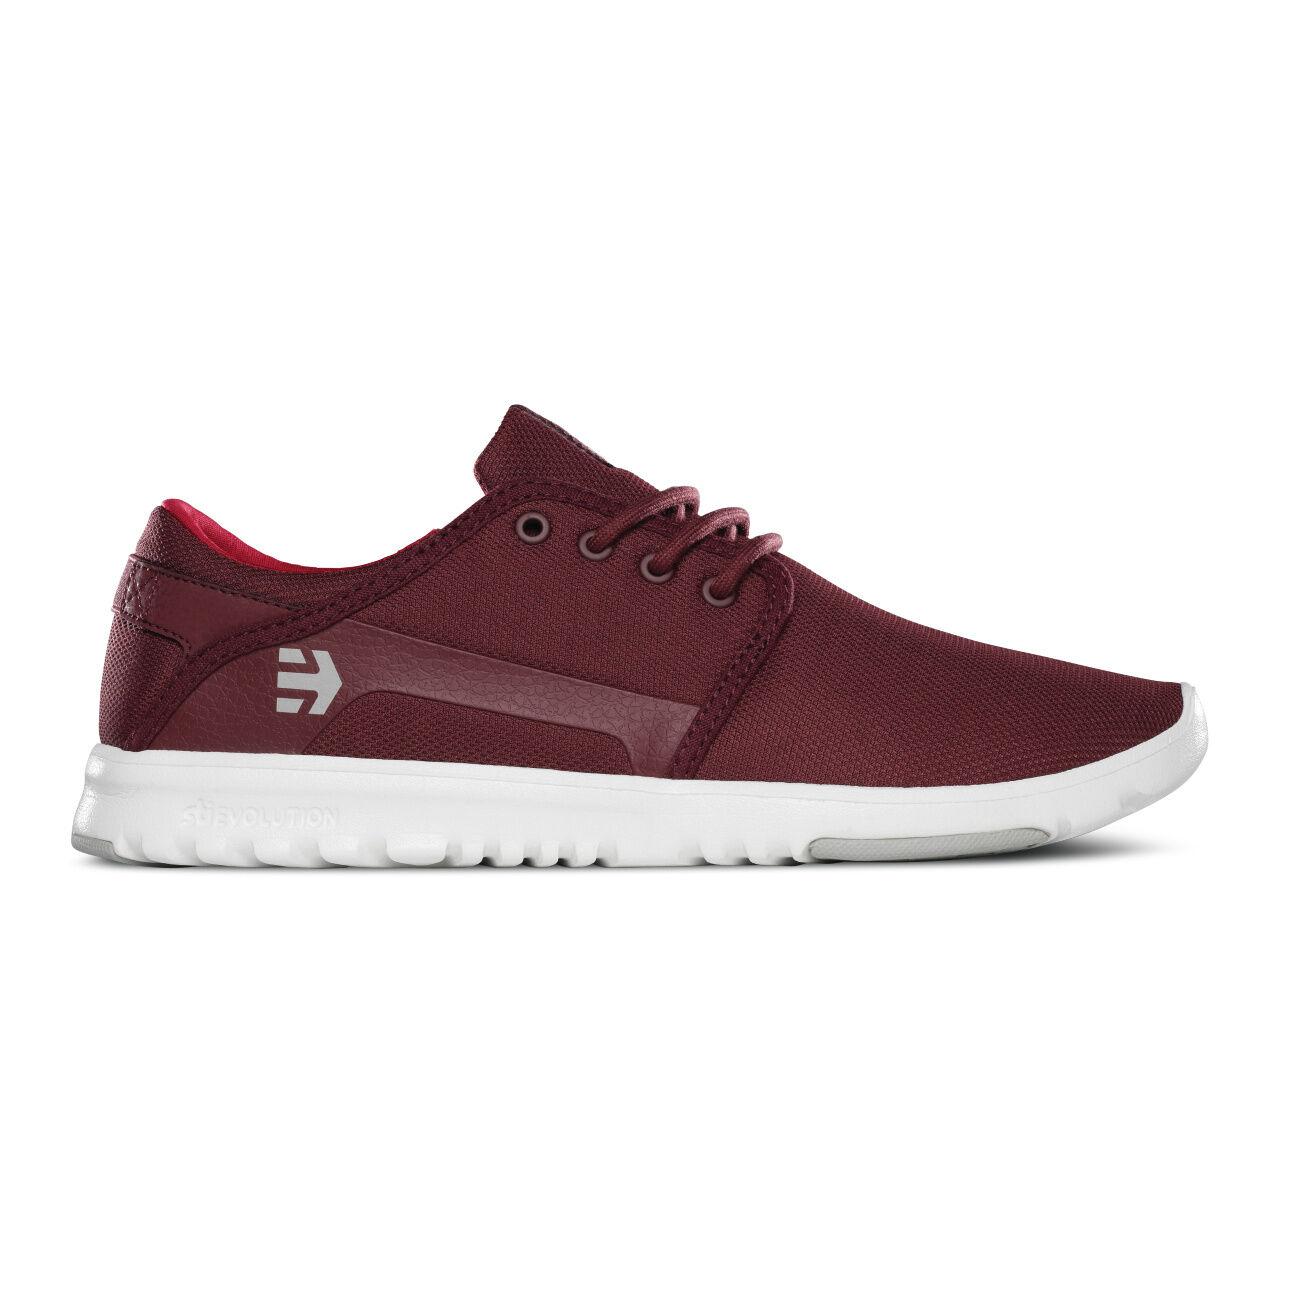 ETNIES Scout Schuhe Sneakers burgundy 4101000419-602